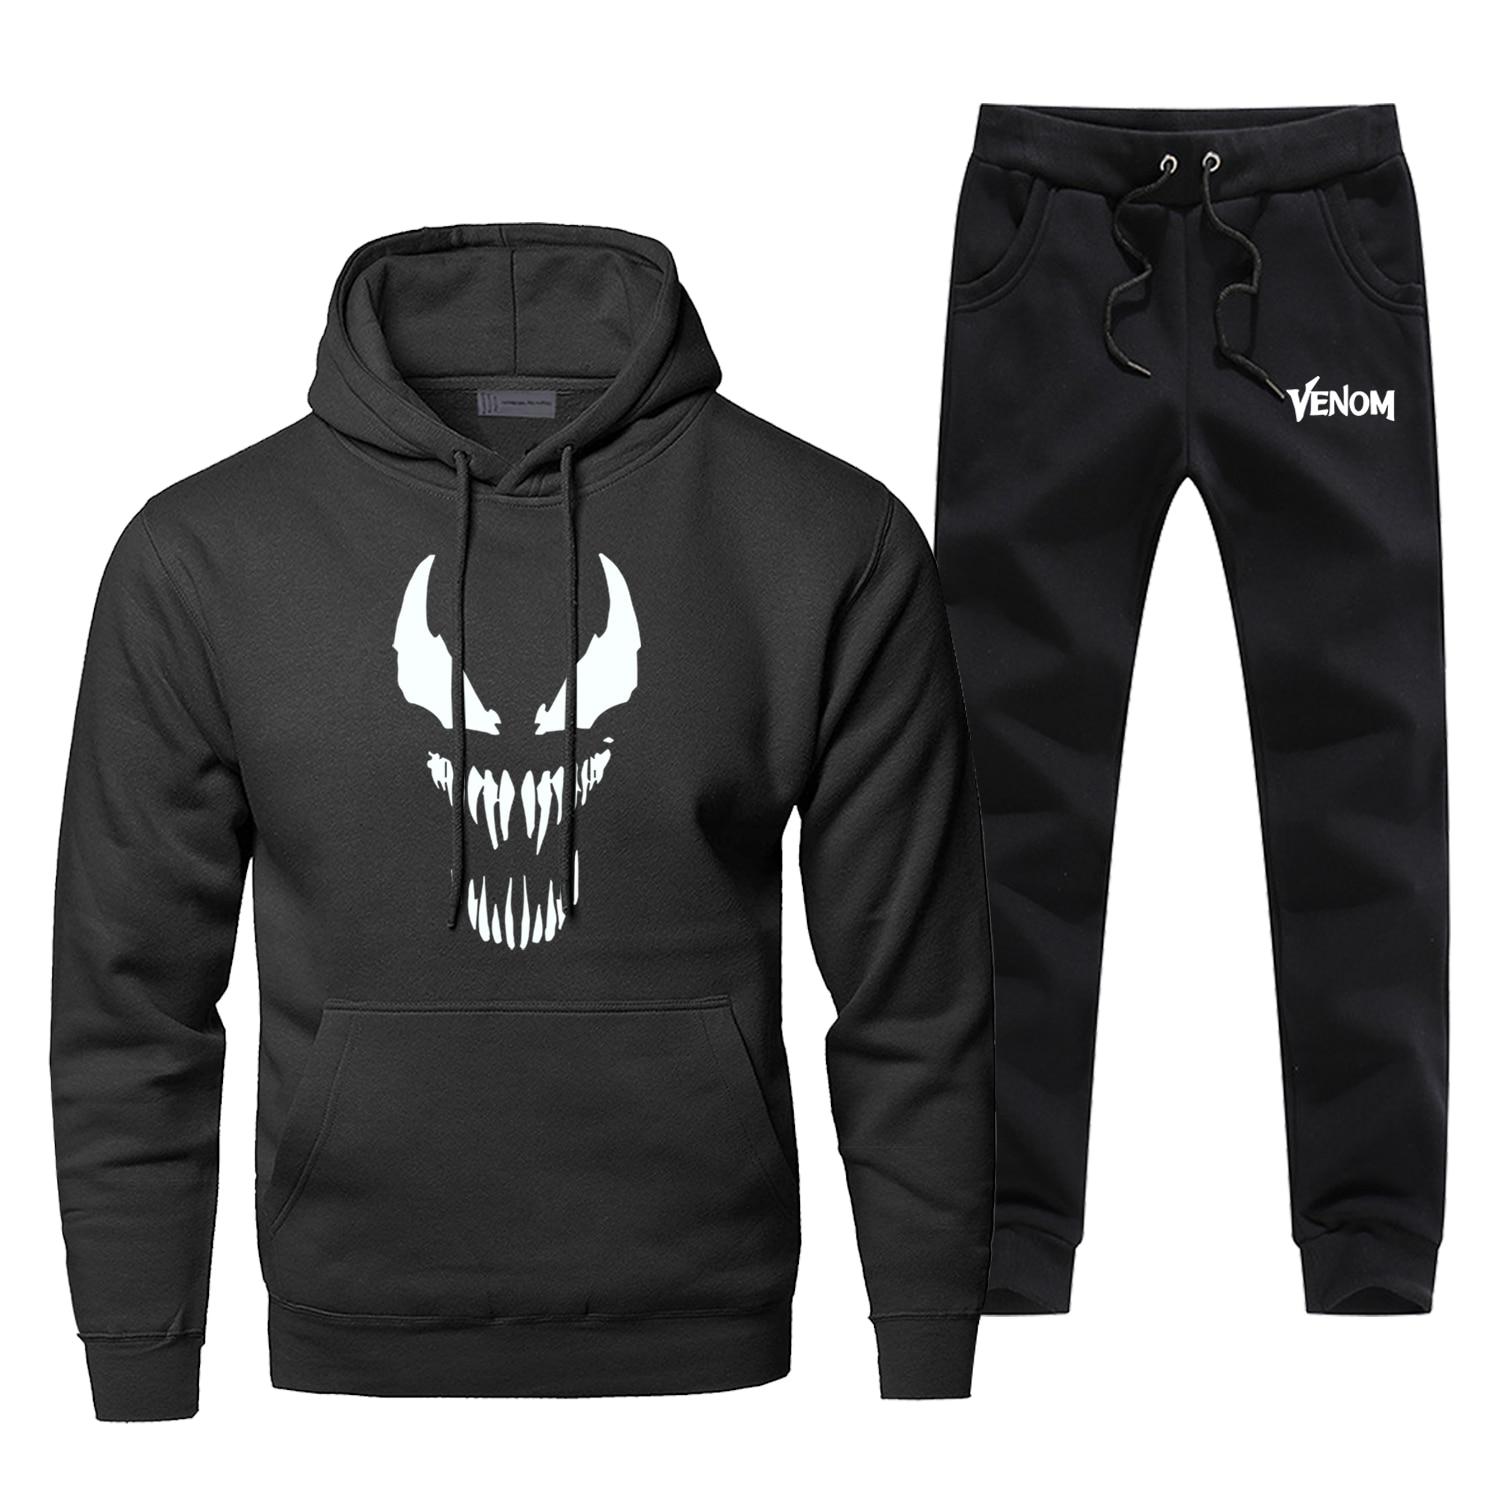 Venom Edward Hoodies Pants Sets Men Suit Tracksuit Movie Superhero Tops Pant Sweatshirt Sweatpants Sportswear Autumn Sports Set